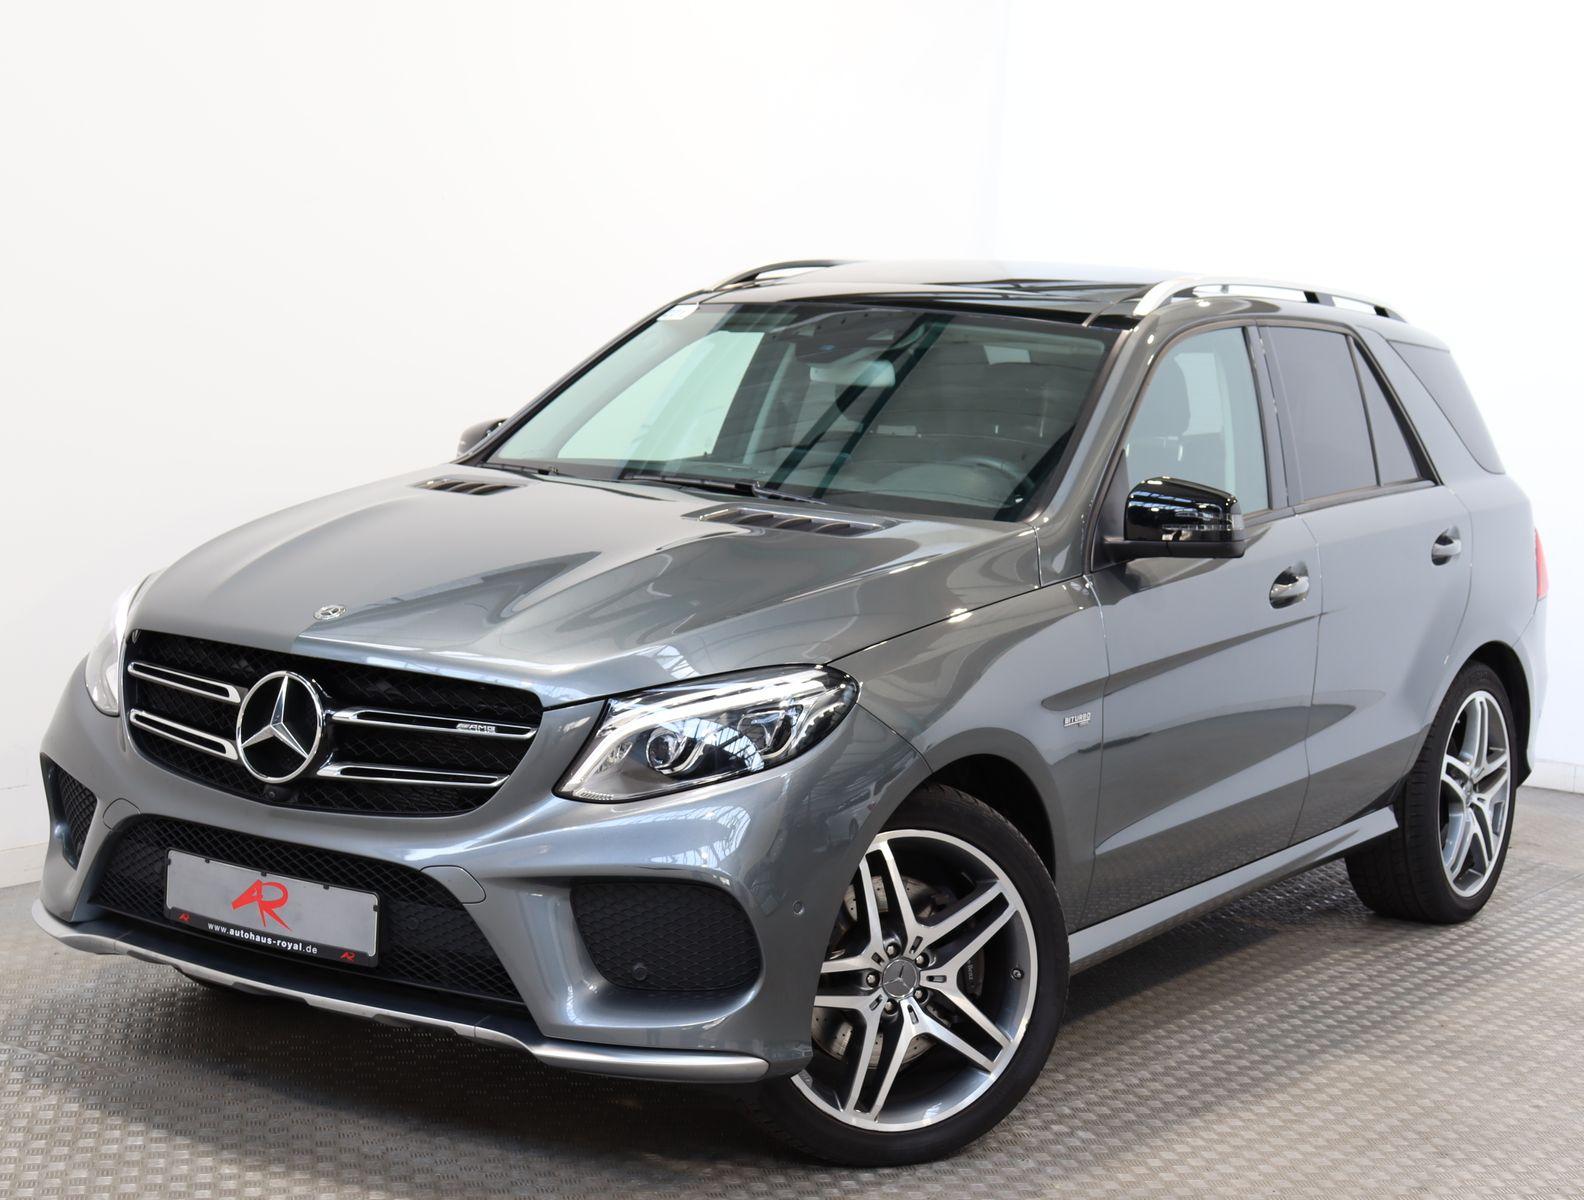 Mercedes-Benz GLE 43 AMG 9G 4M SPORT EDITION AIRMATIC,360 GRAD, Jahr 2017, Benzin